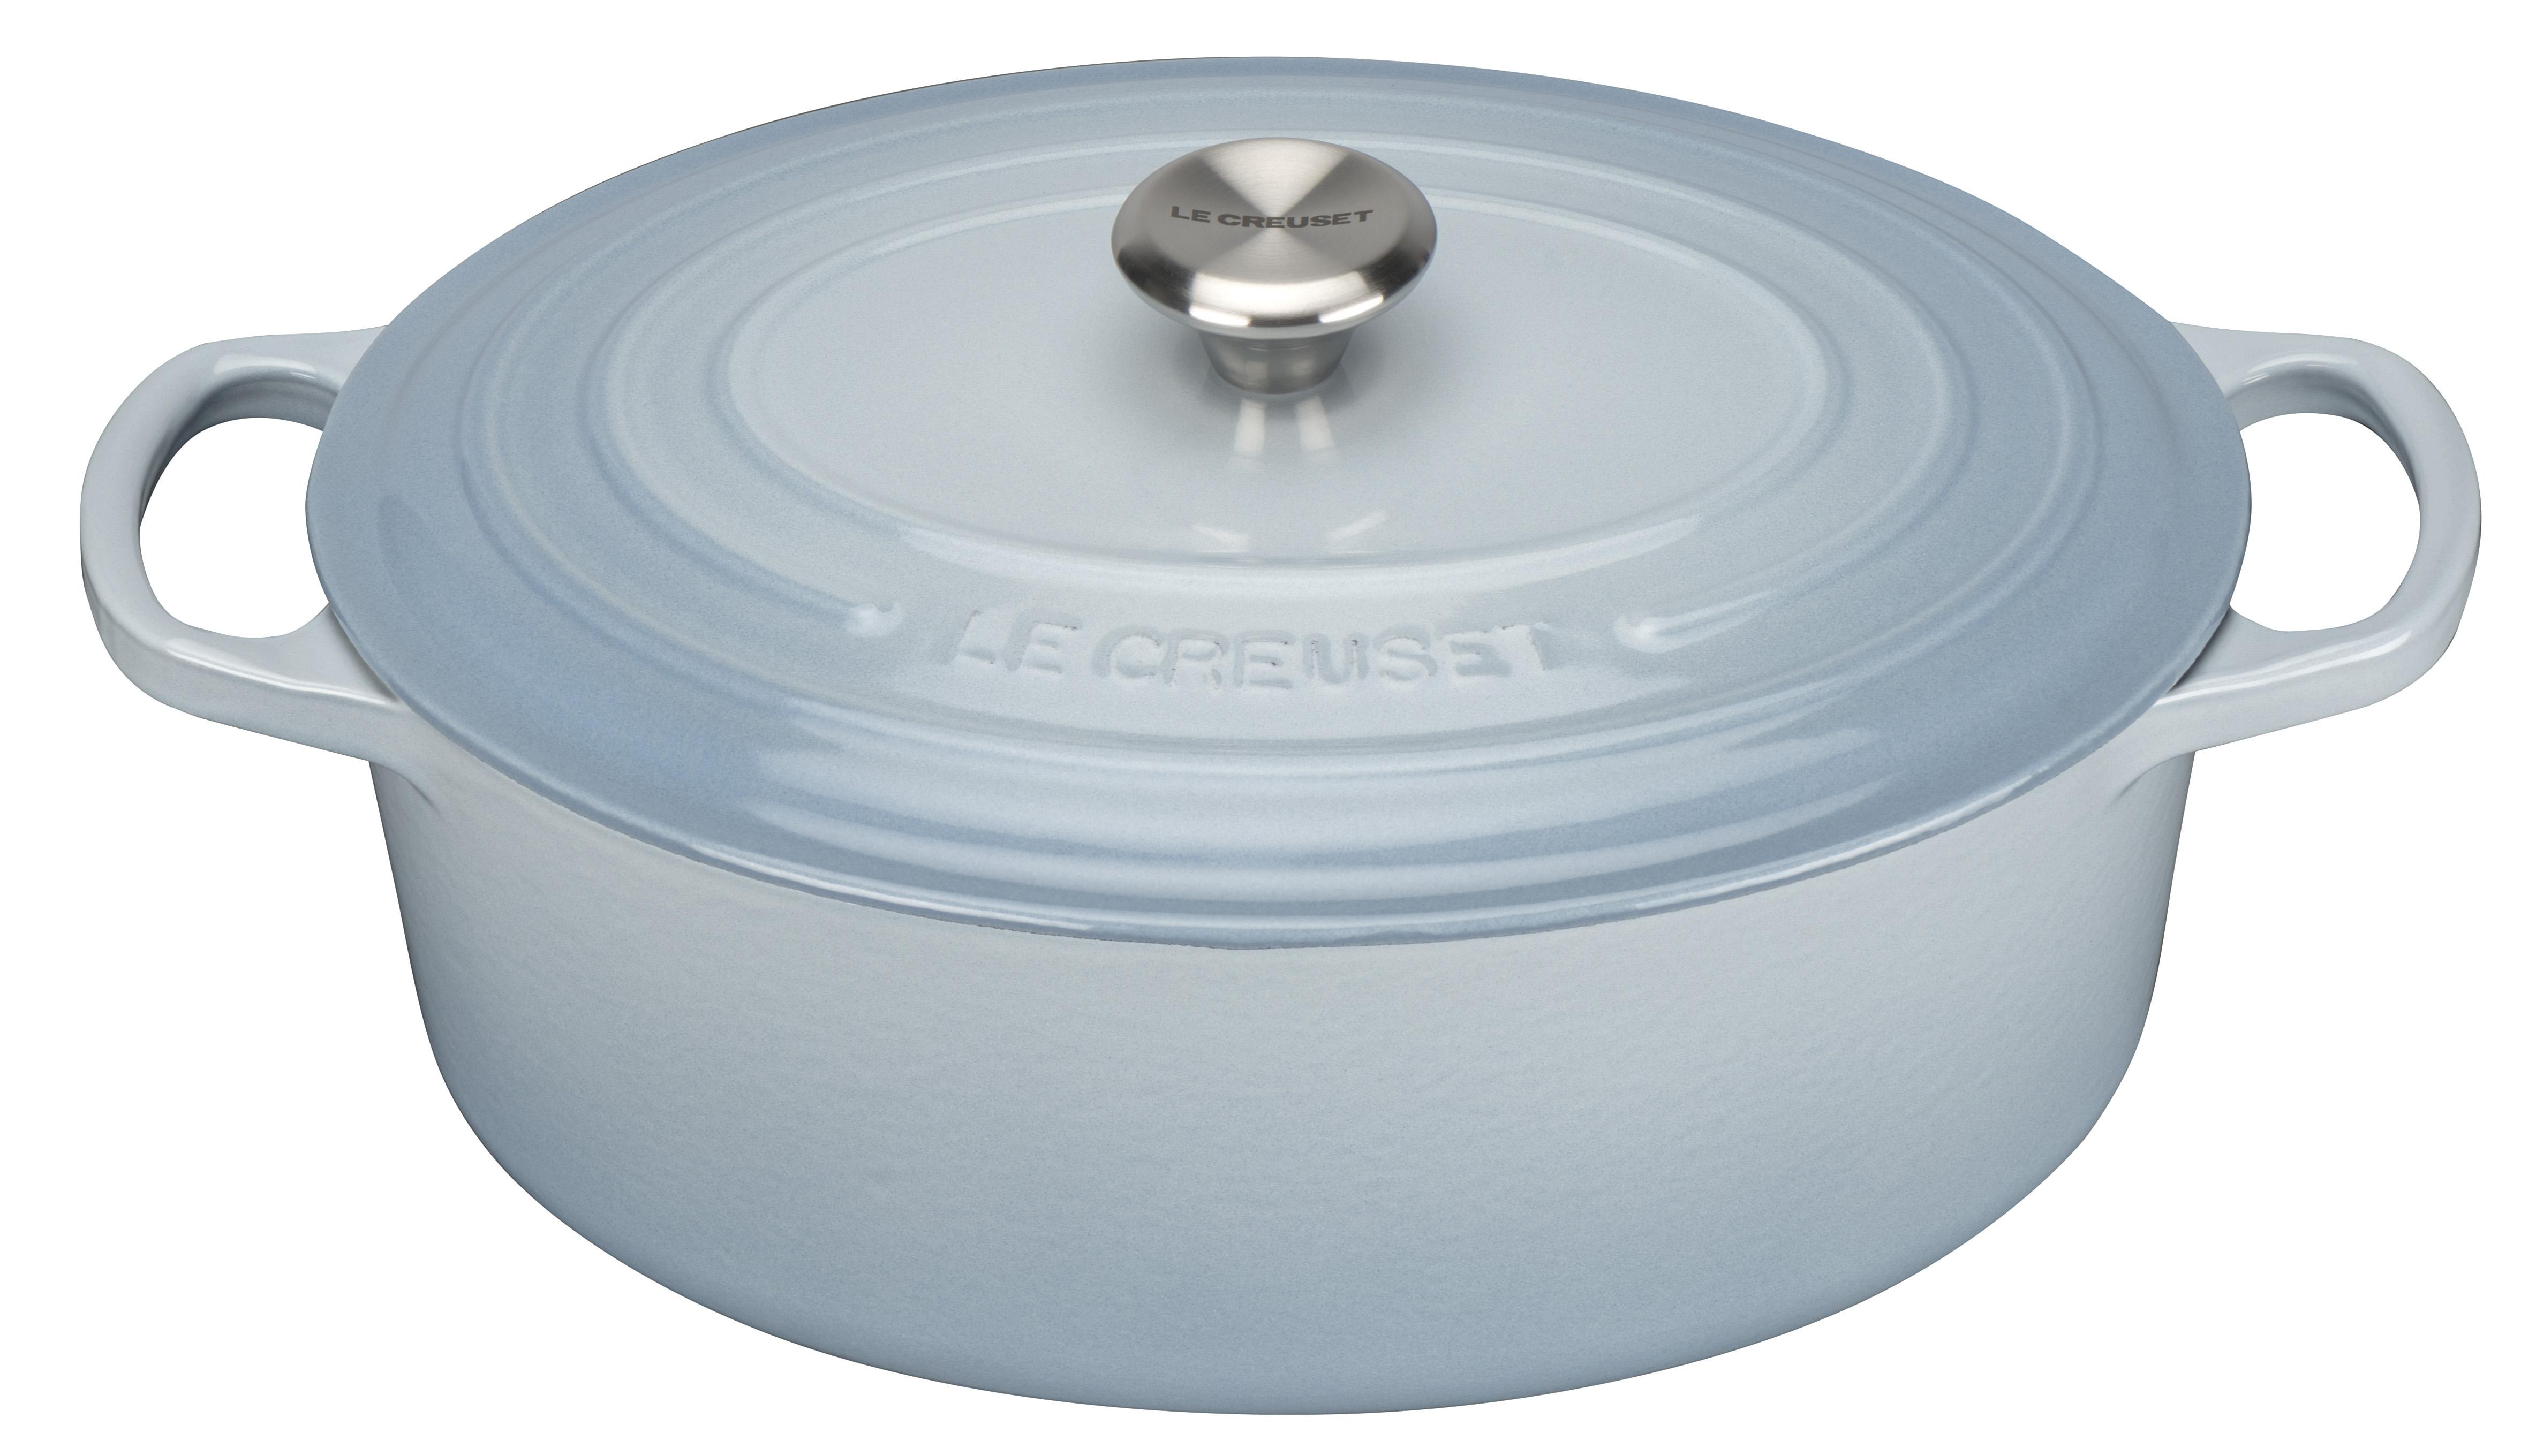 Le Creuset Signature Oval Gryta 27 cm 41 L Coastal Blue